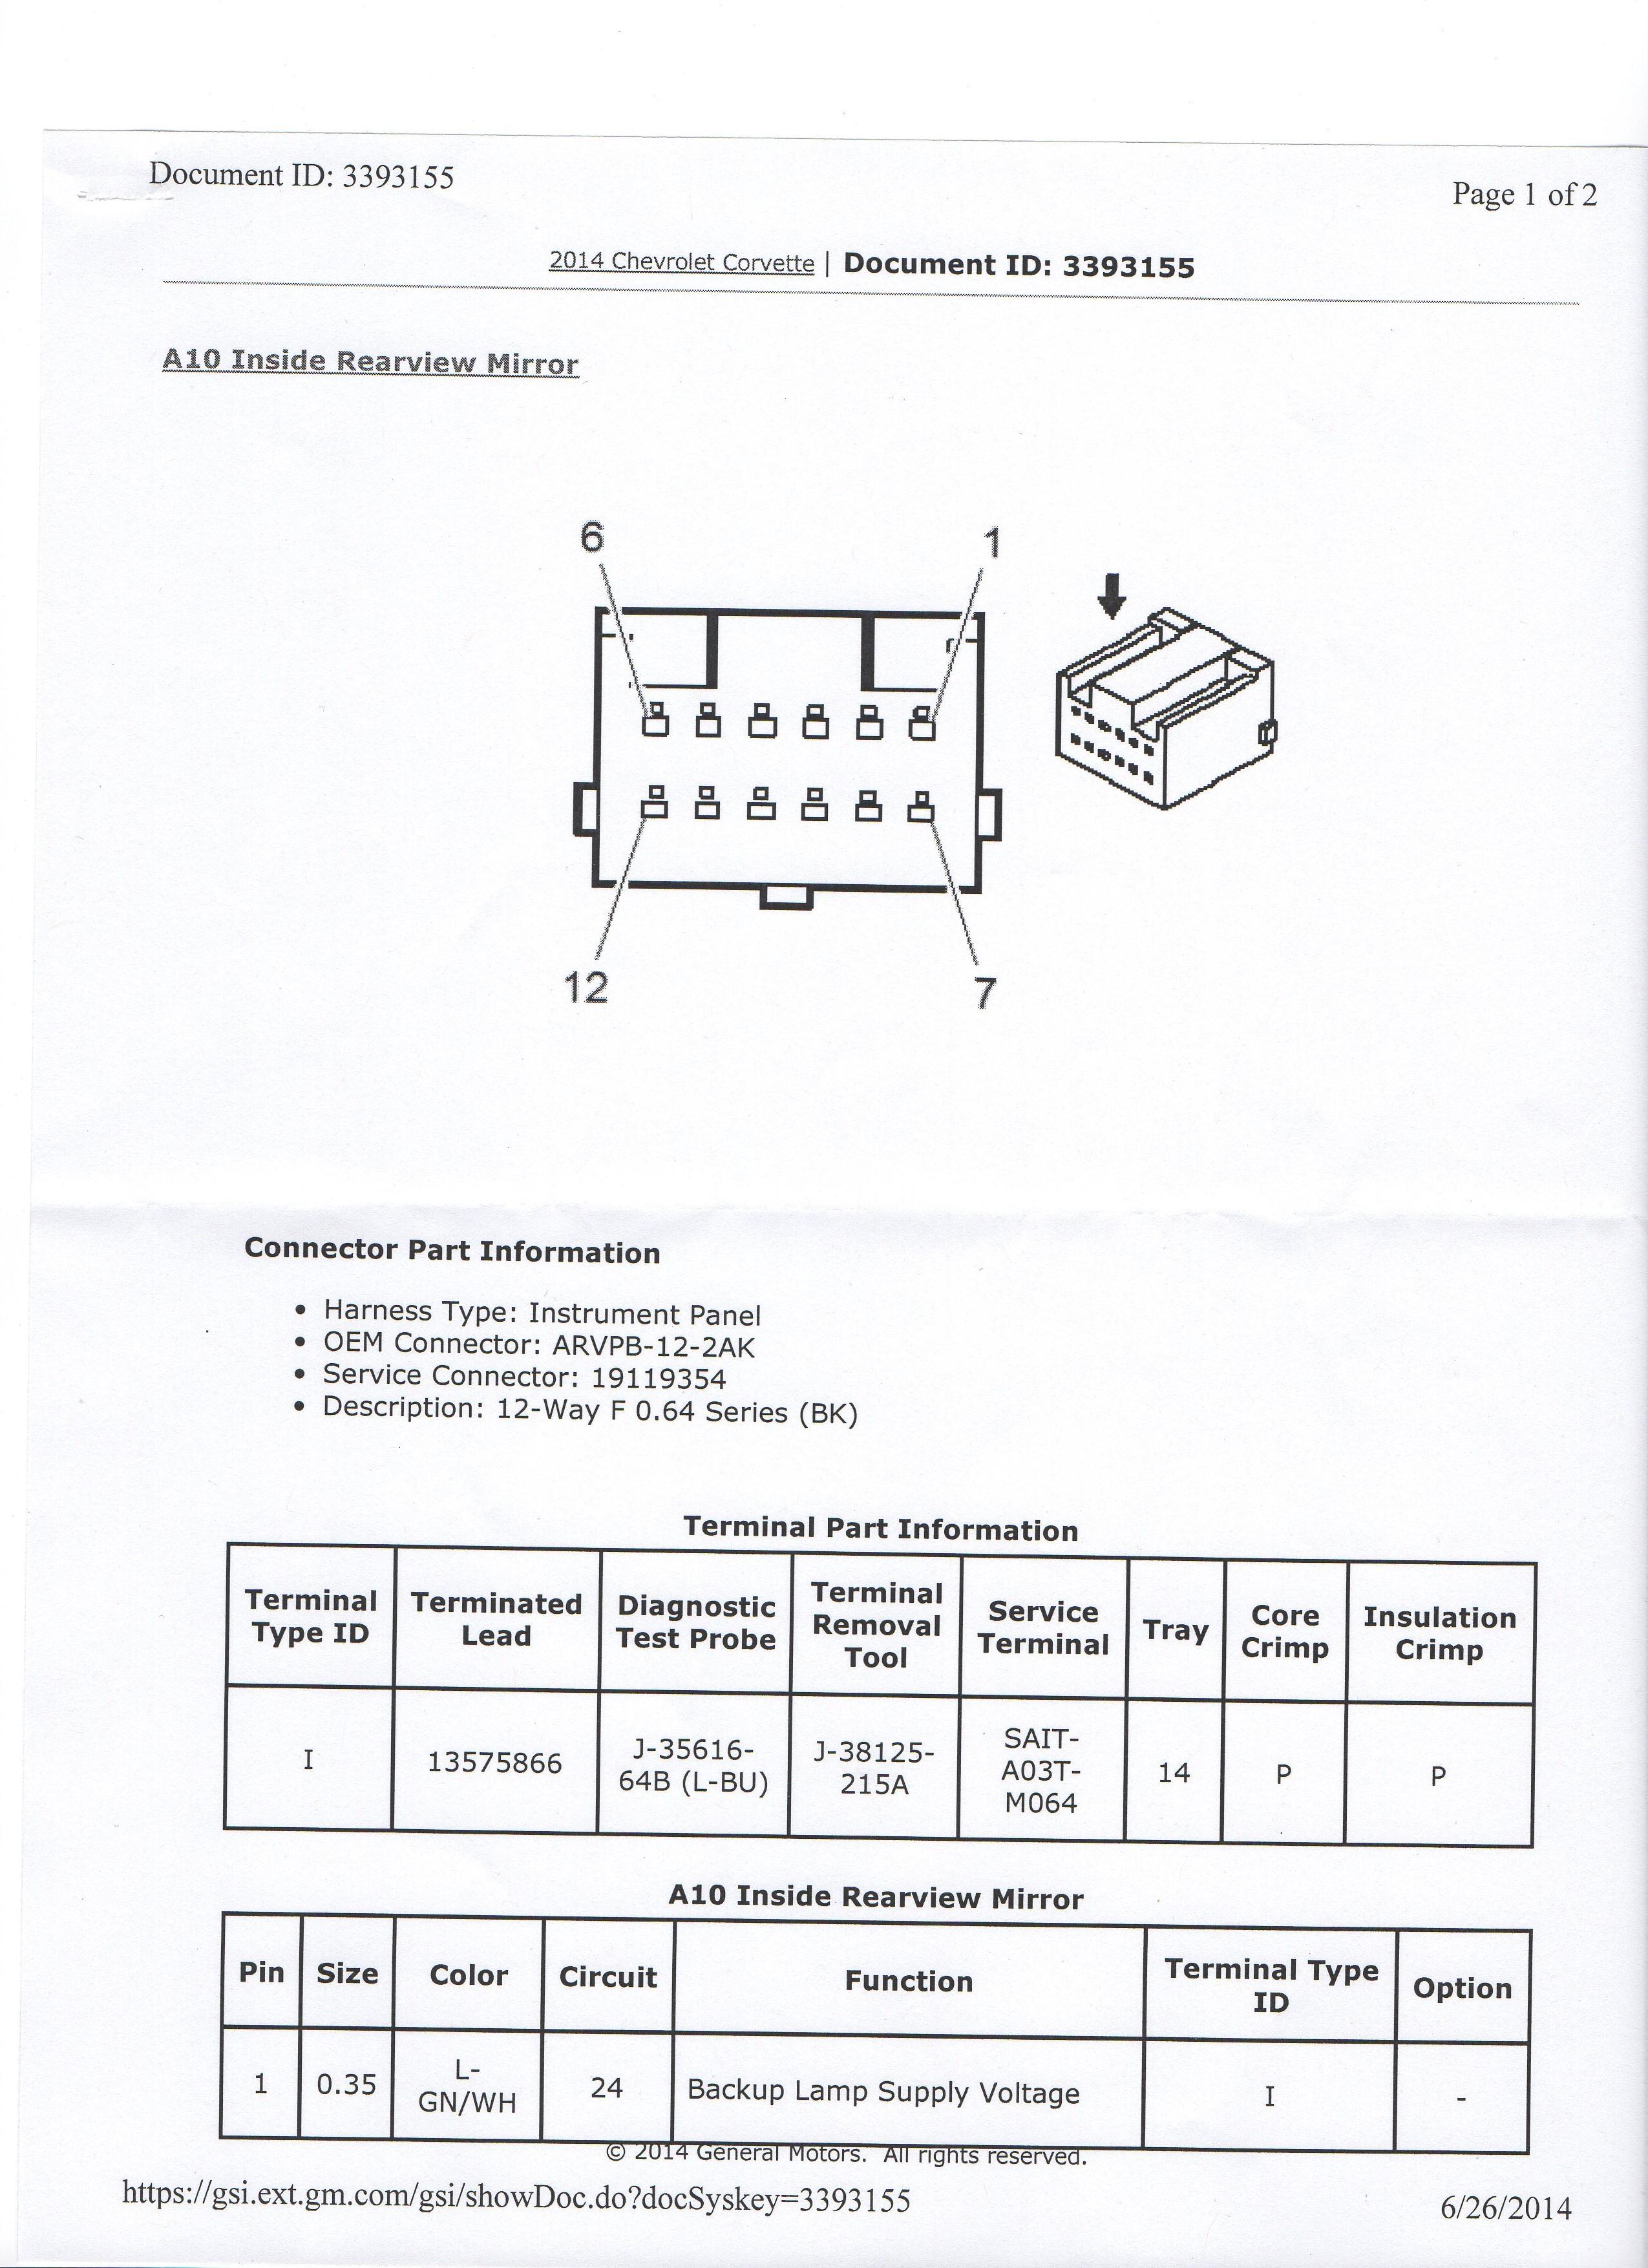 gentex mirror wiring diagram 12 pin gentex mirror wiring diagram general discussion